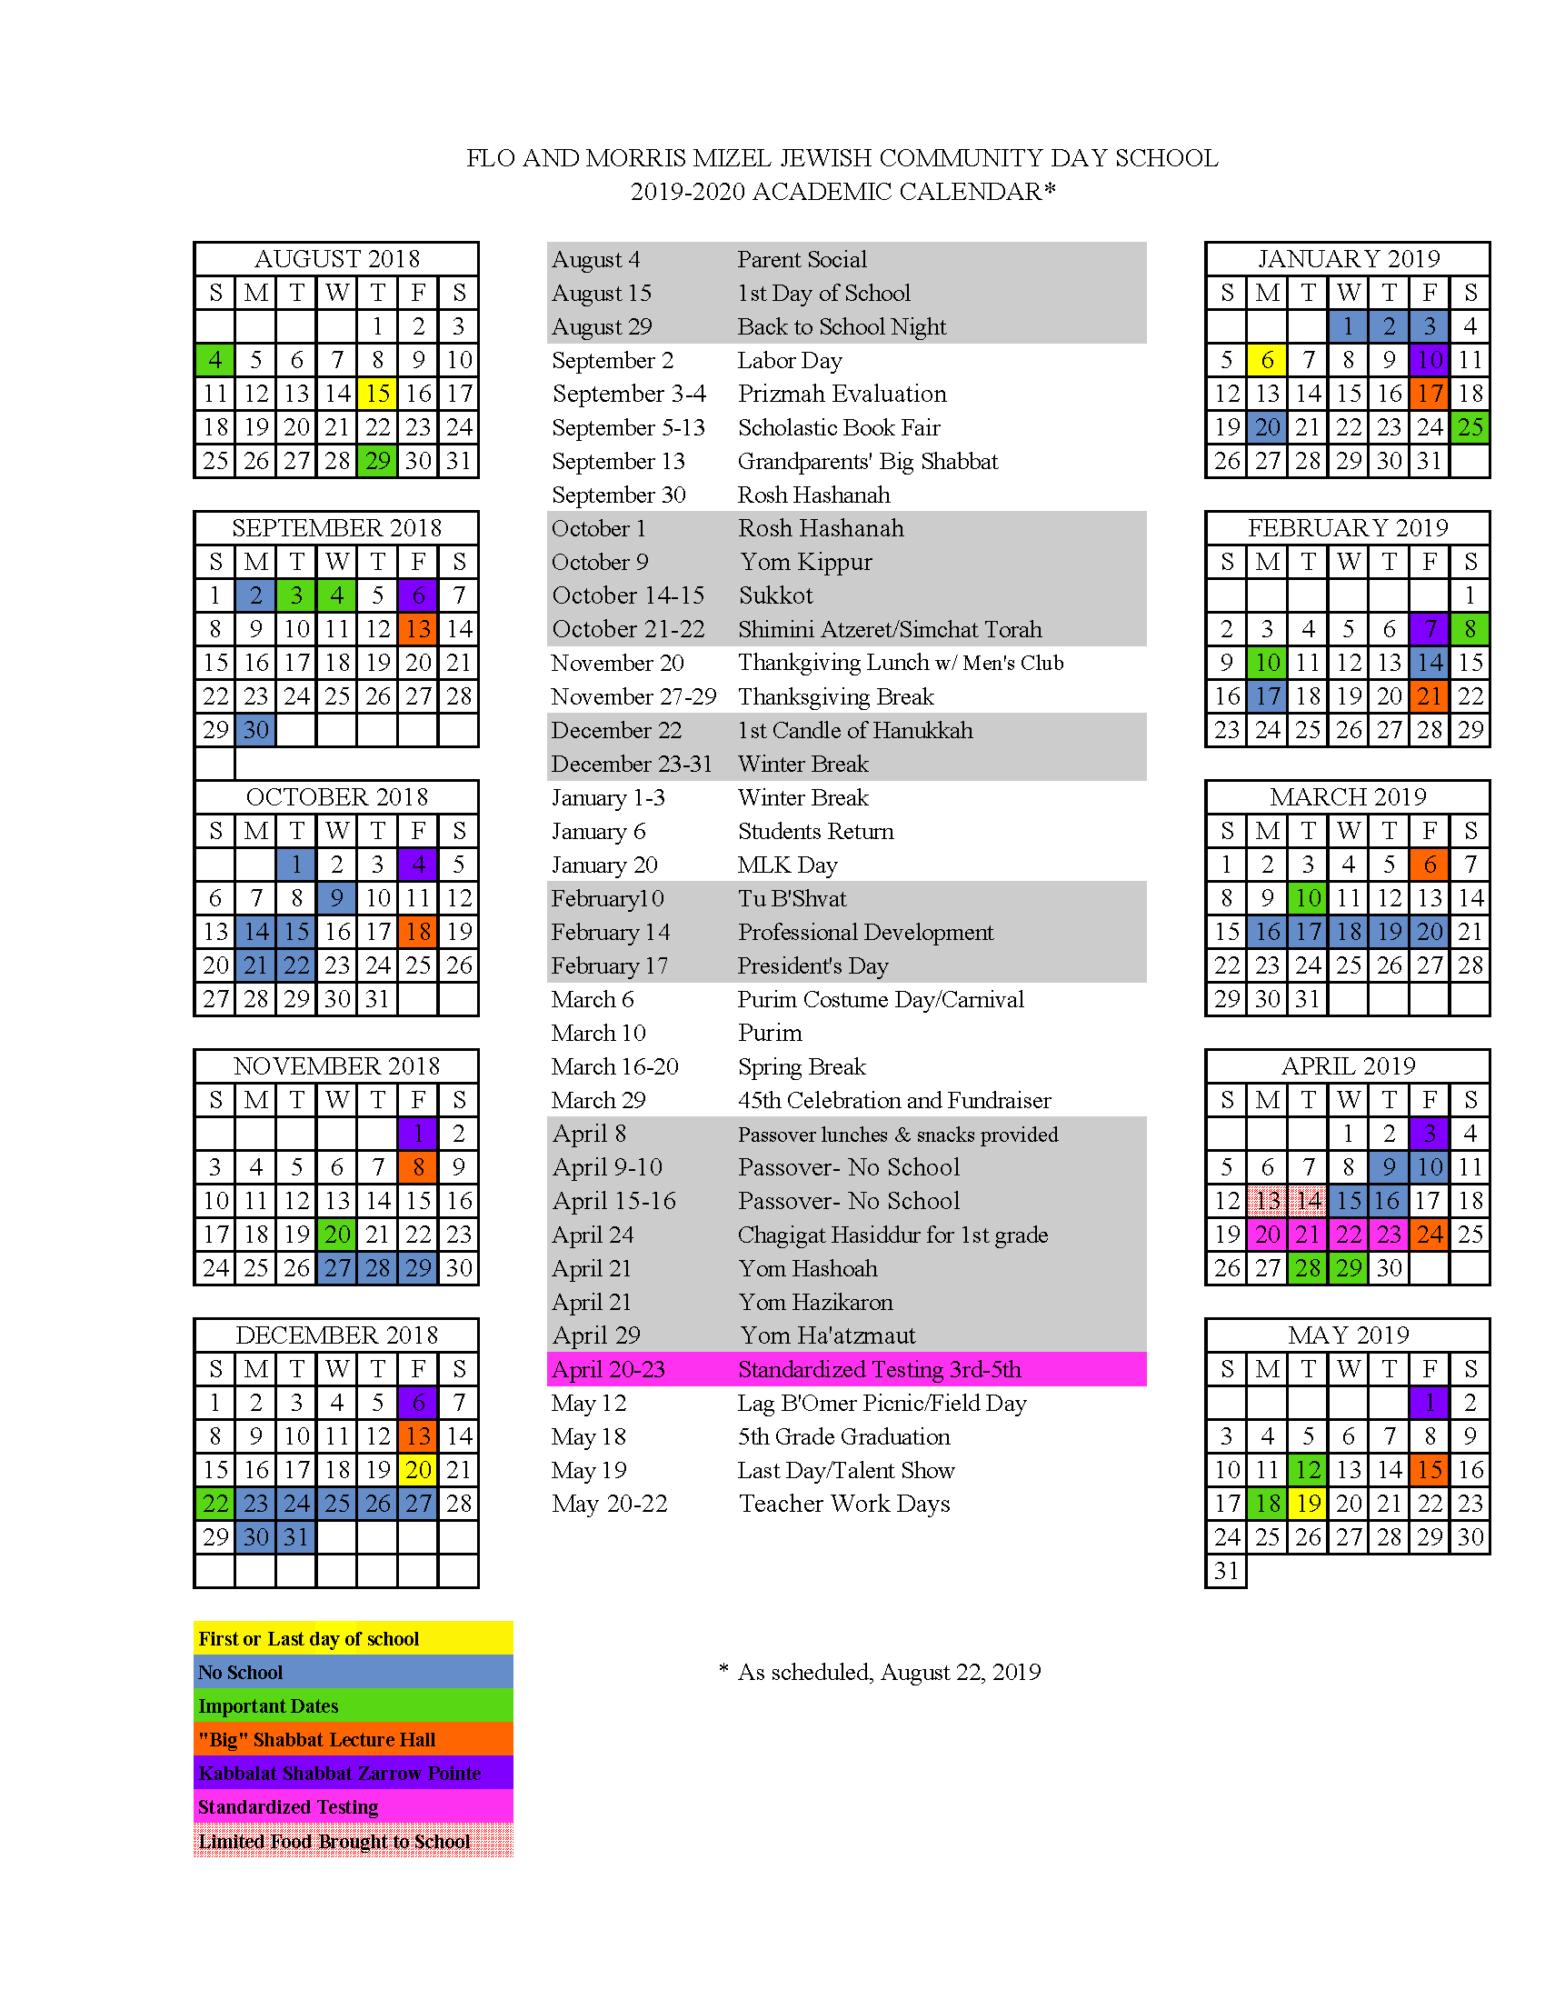 School Calendar - Mizel Jewish Community Day School For Academic Calendar 2021 Tulsa University